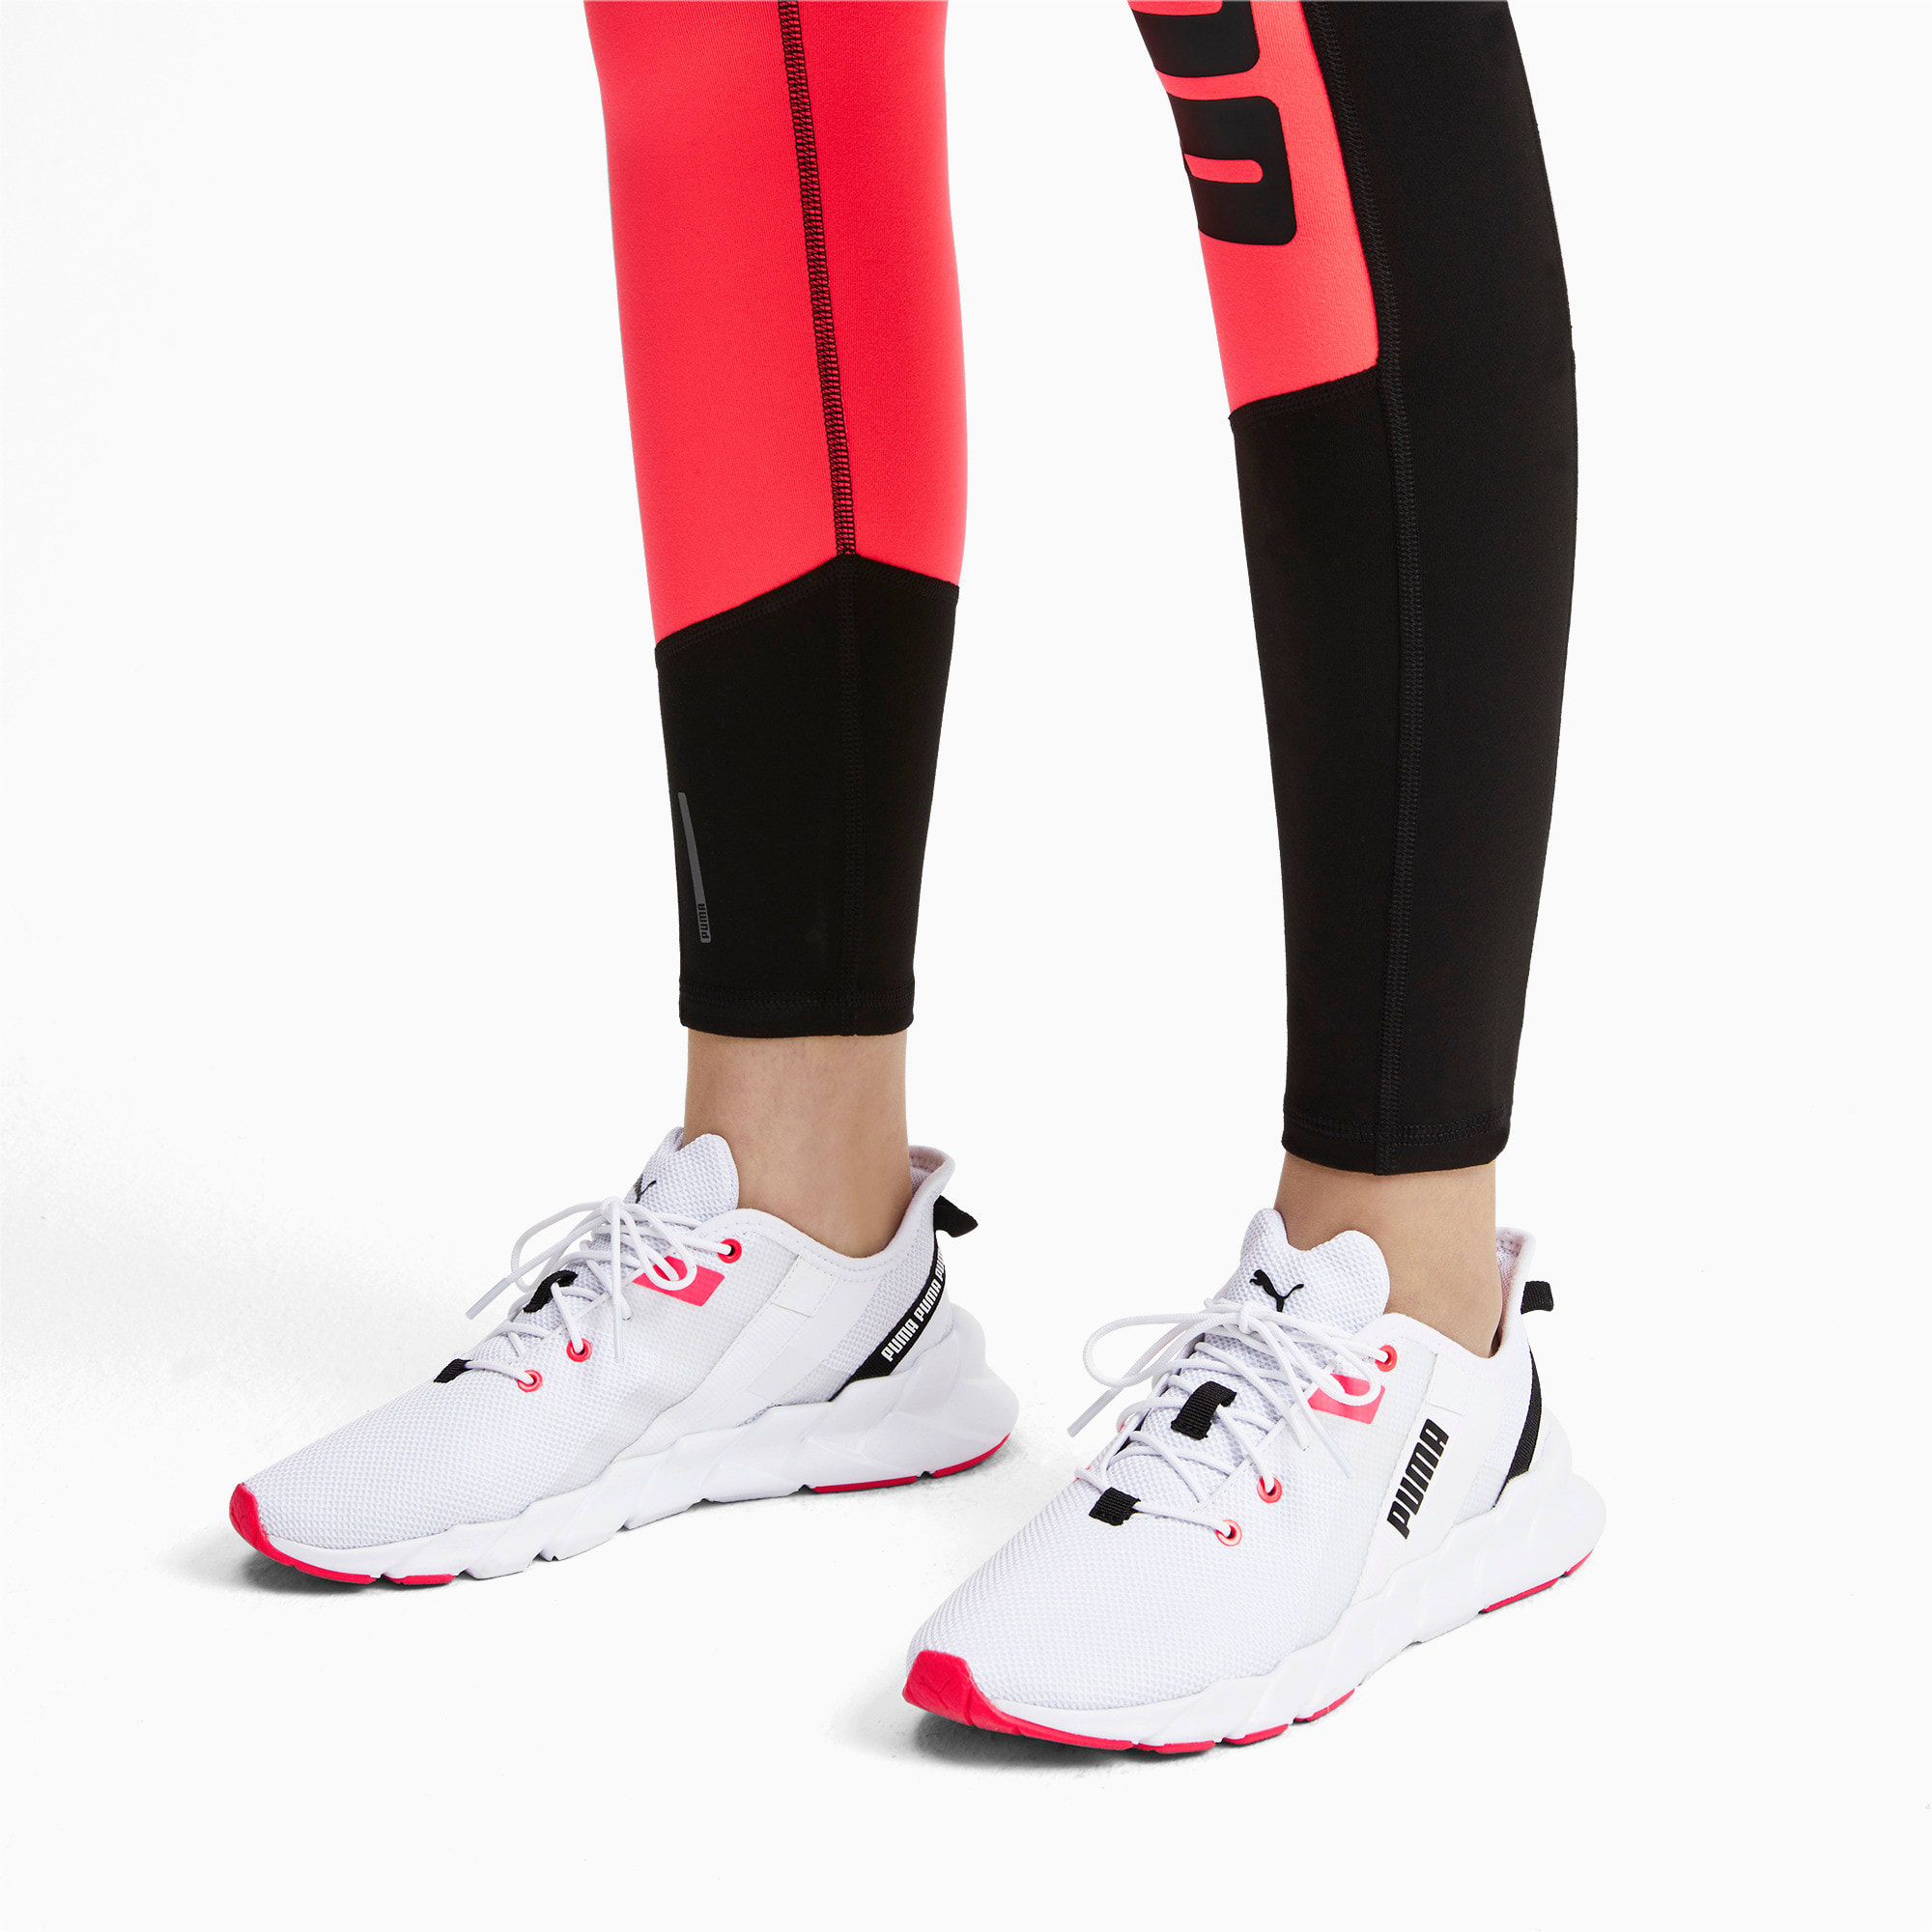 Thumbnail 2 of Weave XT Women's Training Shoes, Puma White-Pink Alert, medium